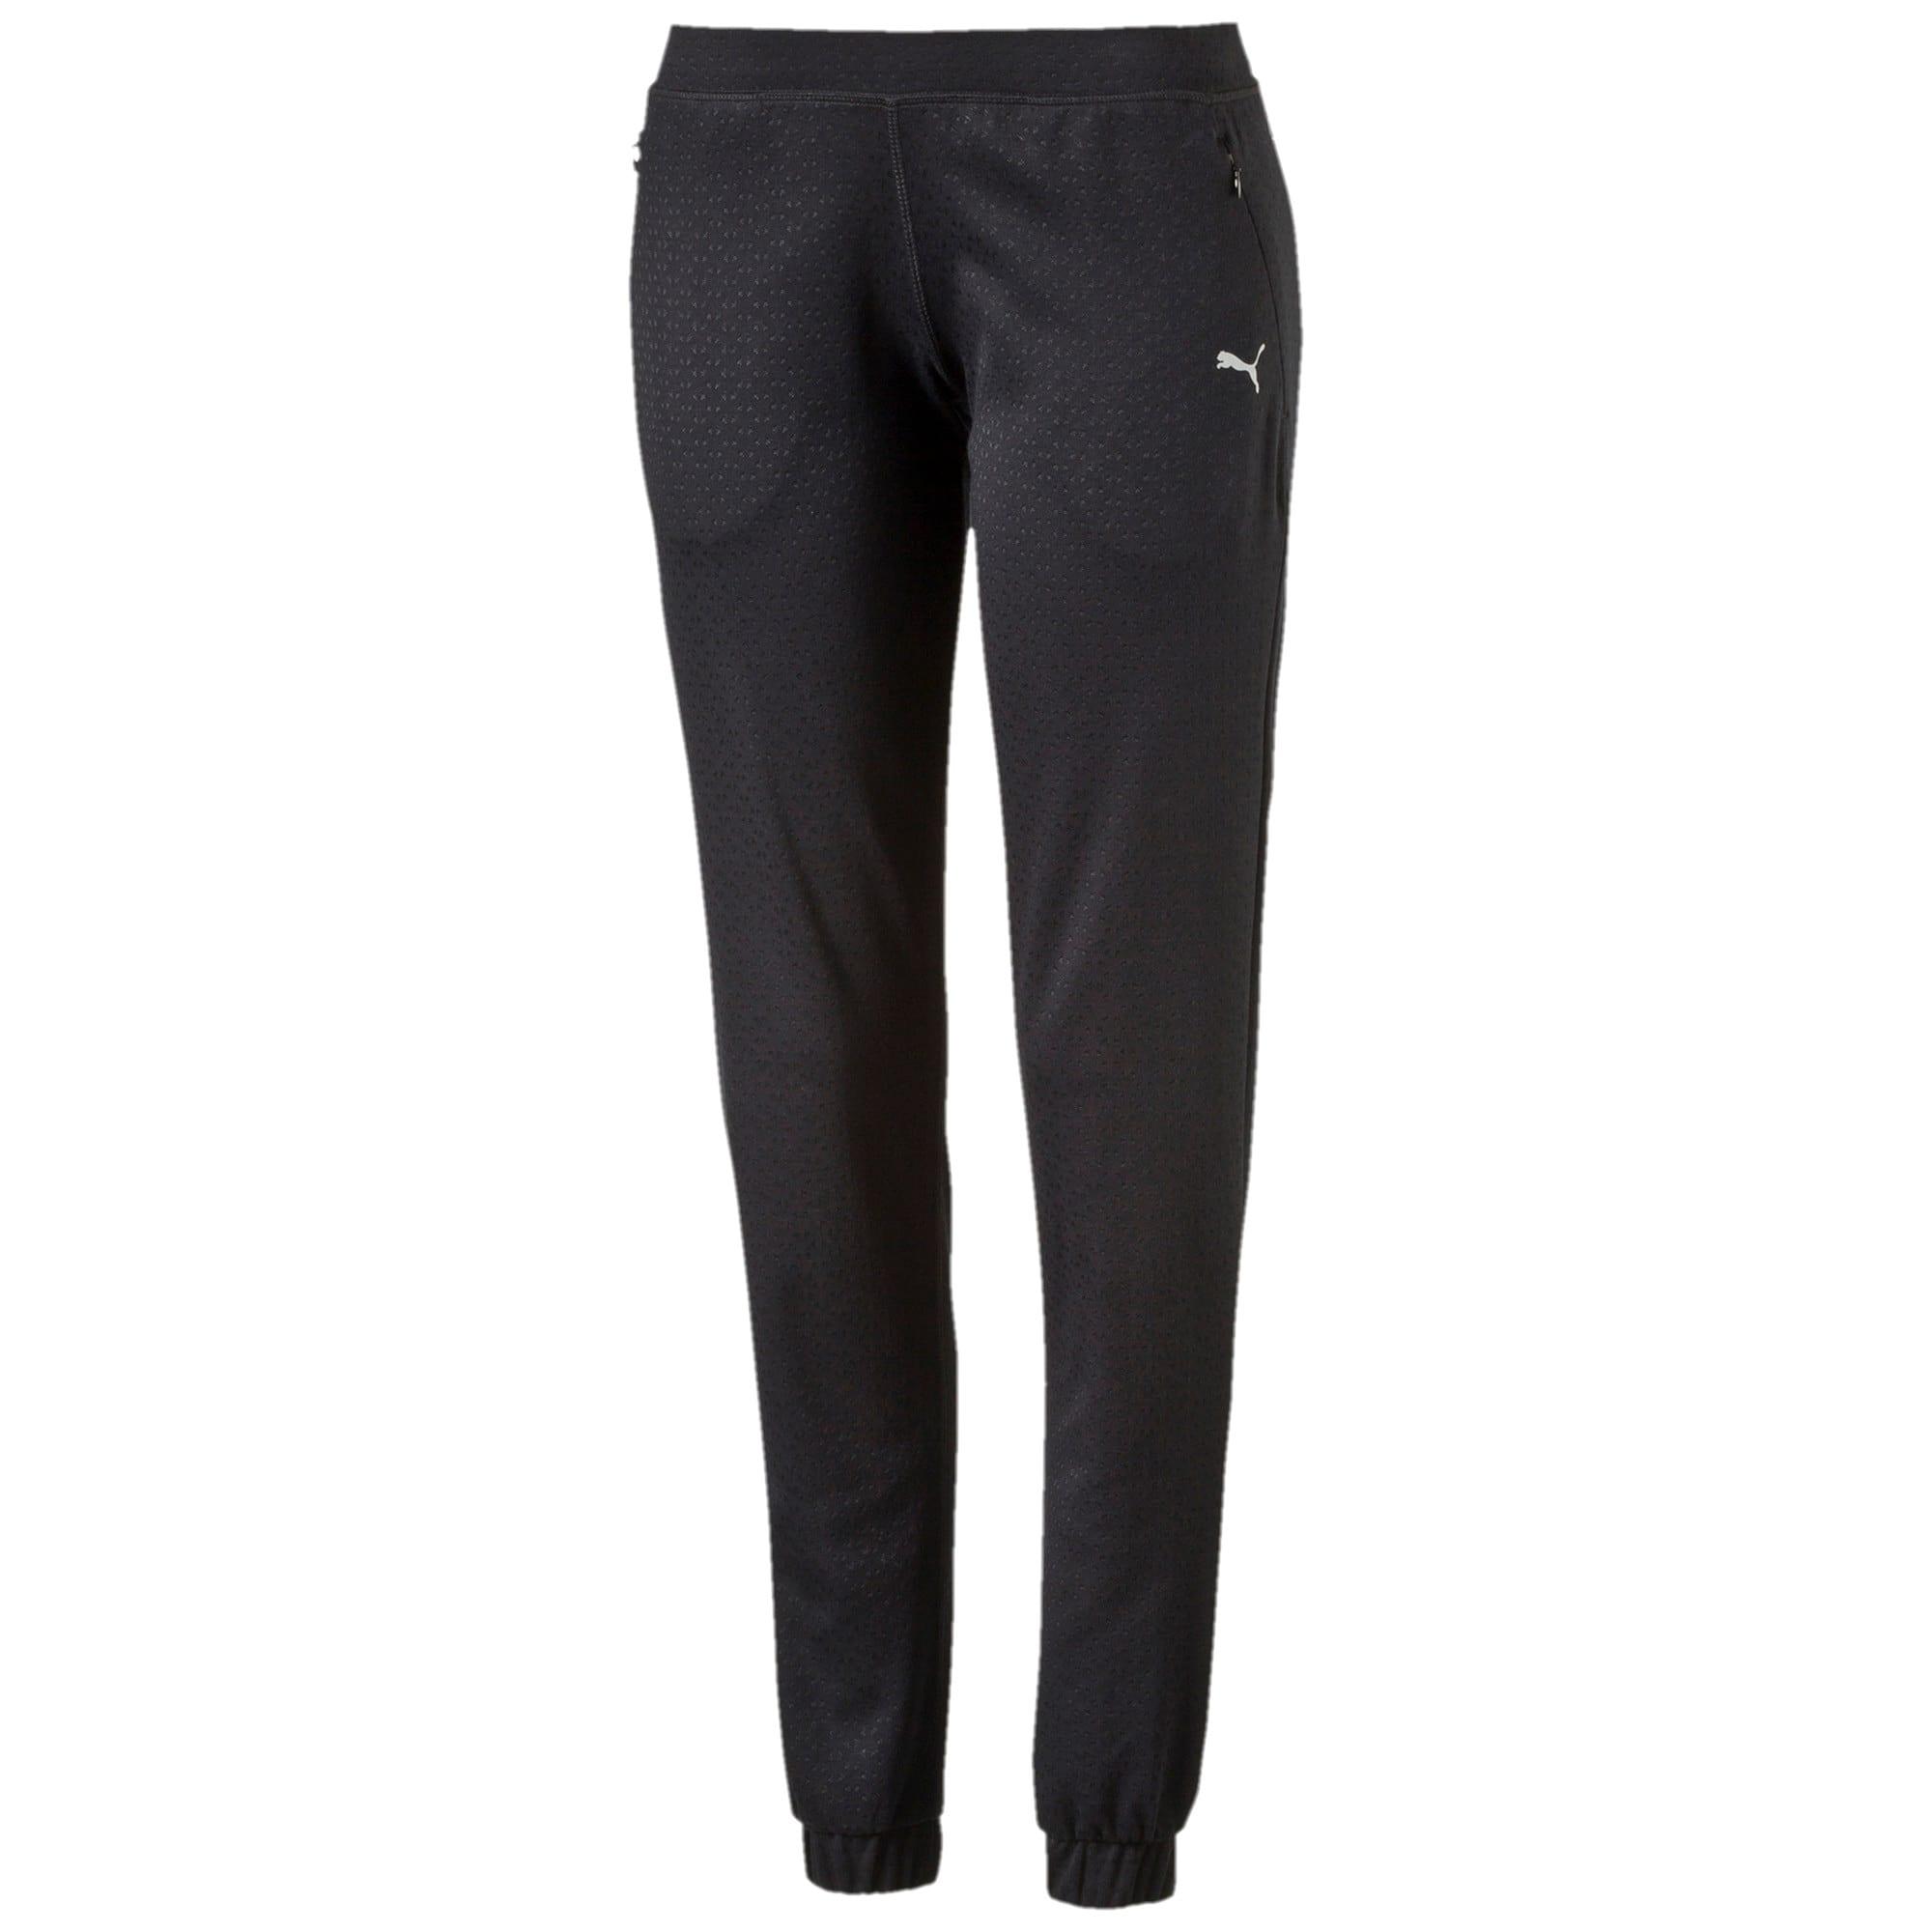 Thumbnail 1 of Training Yogini Bottom Women's Track Pants, black, medium-IND